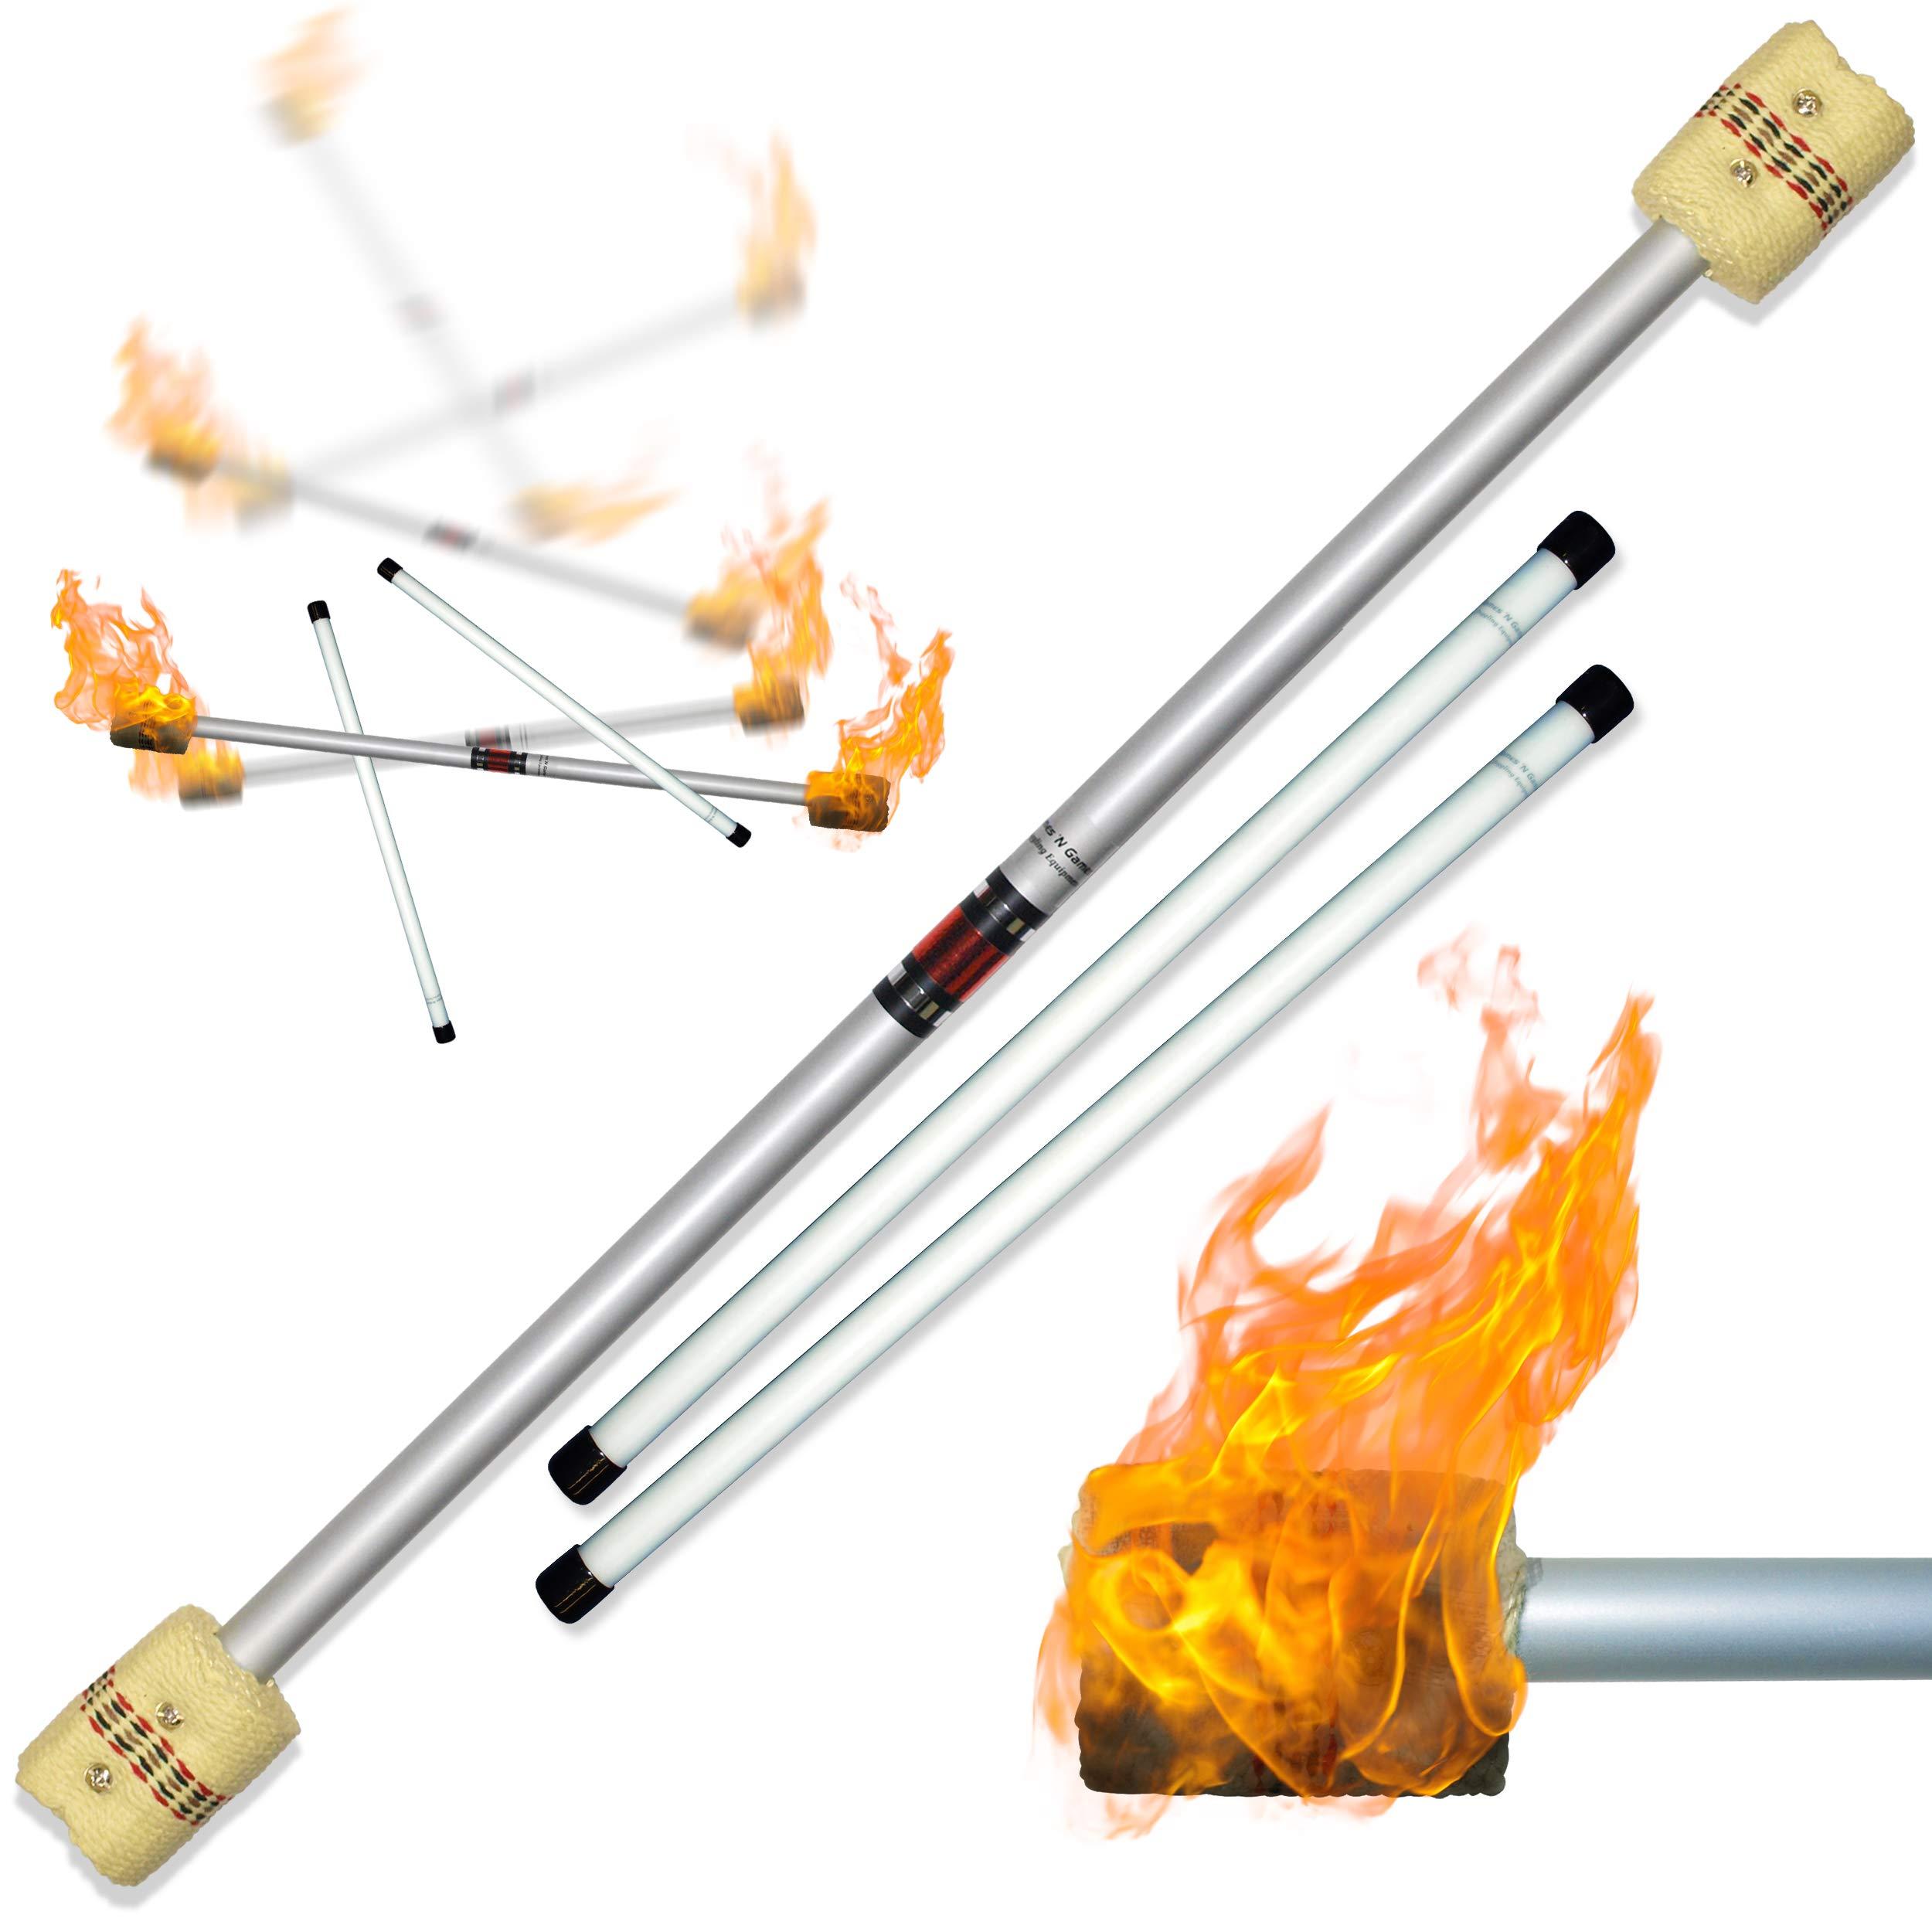 Flames N Games FIRE Devil Stick Set (65mm Wicks) Ultra-Strong FIBRE Sticks! Juggling Devil sticks for Beginners & Pro's alike! by Flames N Games Fire Devil Sticks/Flower Sticks